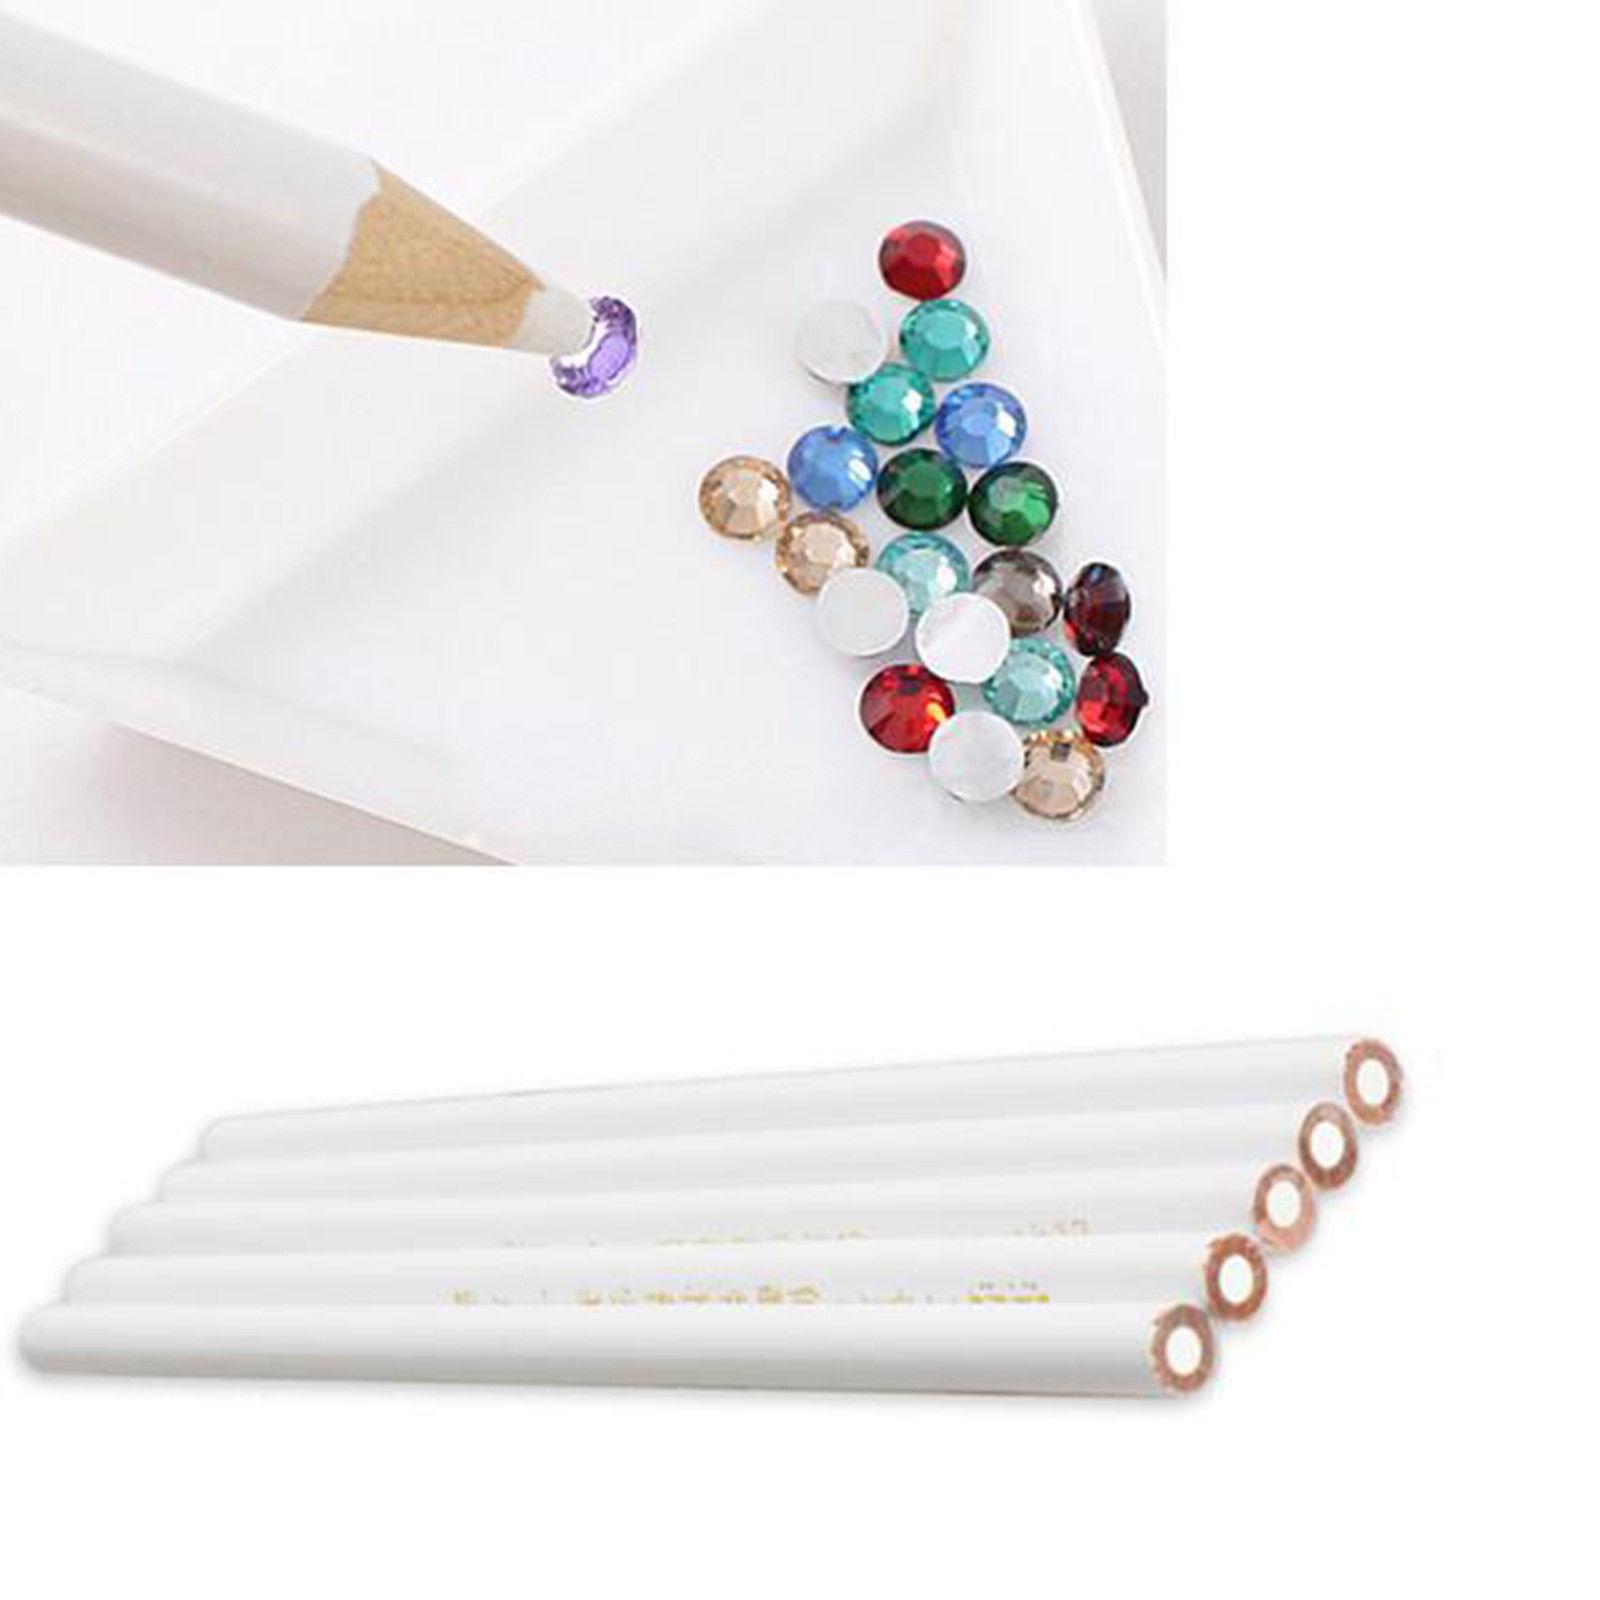 Pencil Rhinestones Gems Picker Glamorous Nail Supplies